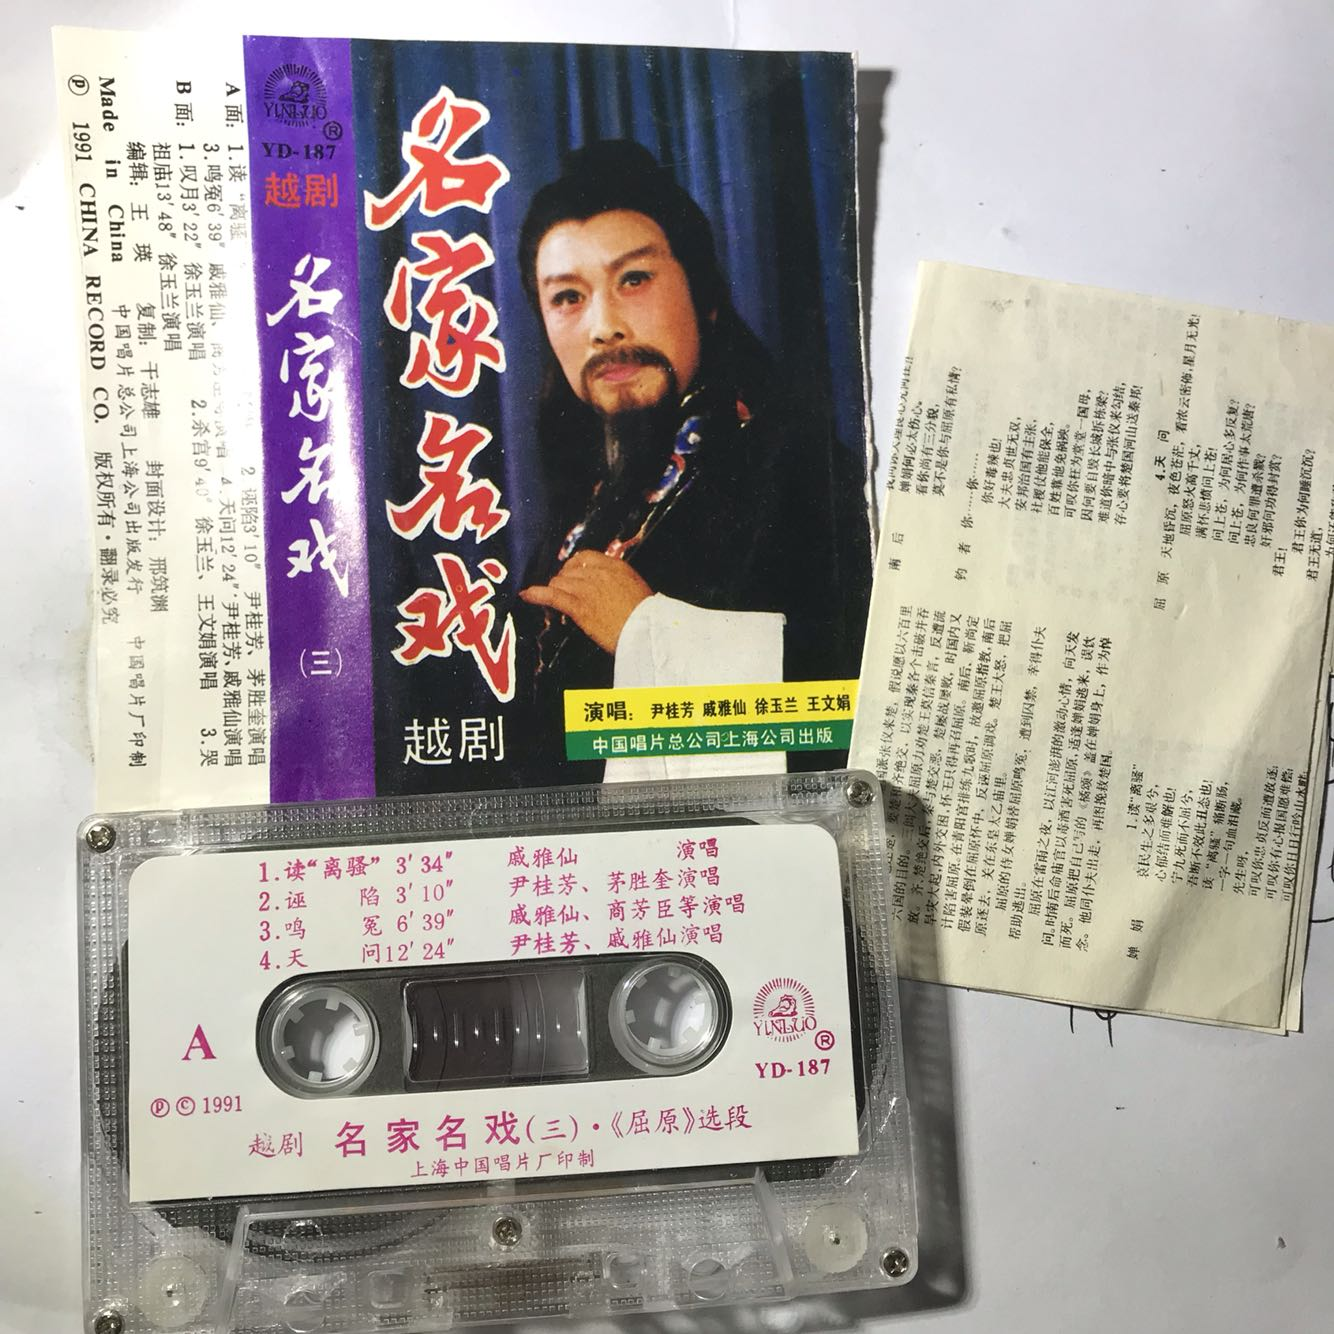 【正版テープ】越劇名家名劇(三)屈原選段尹桂芳戚雅仙など